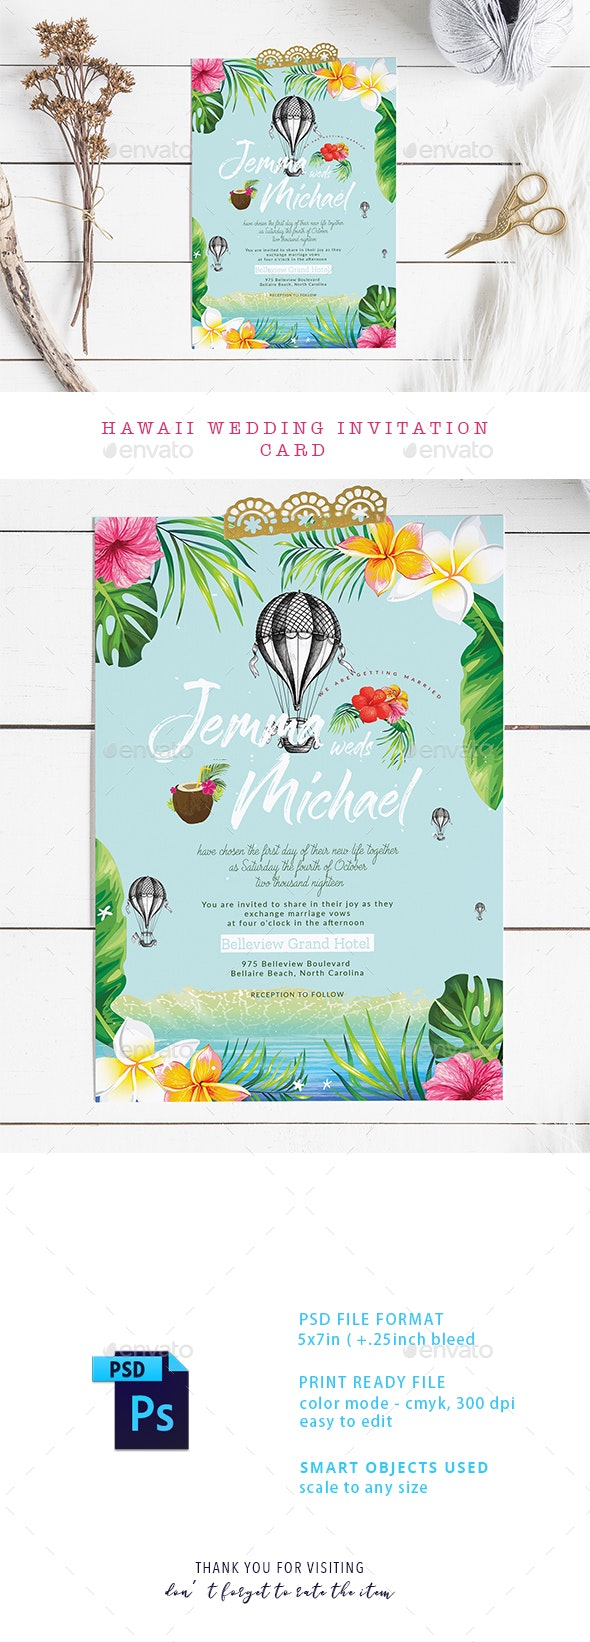 Hawaii Wedding Invitation Card - Weddings Cards & Invites